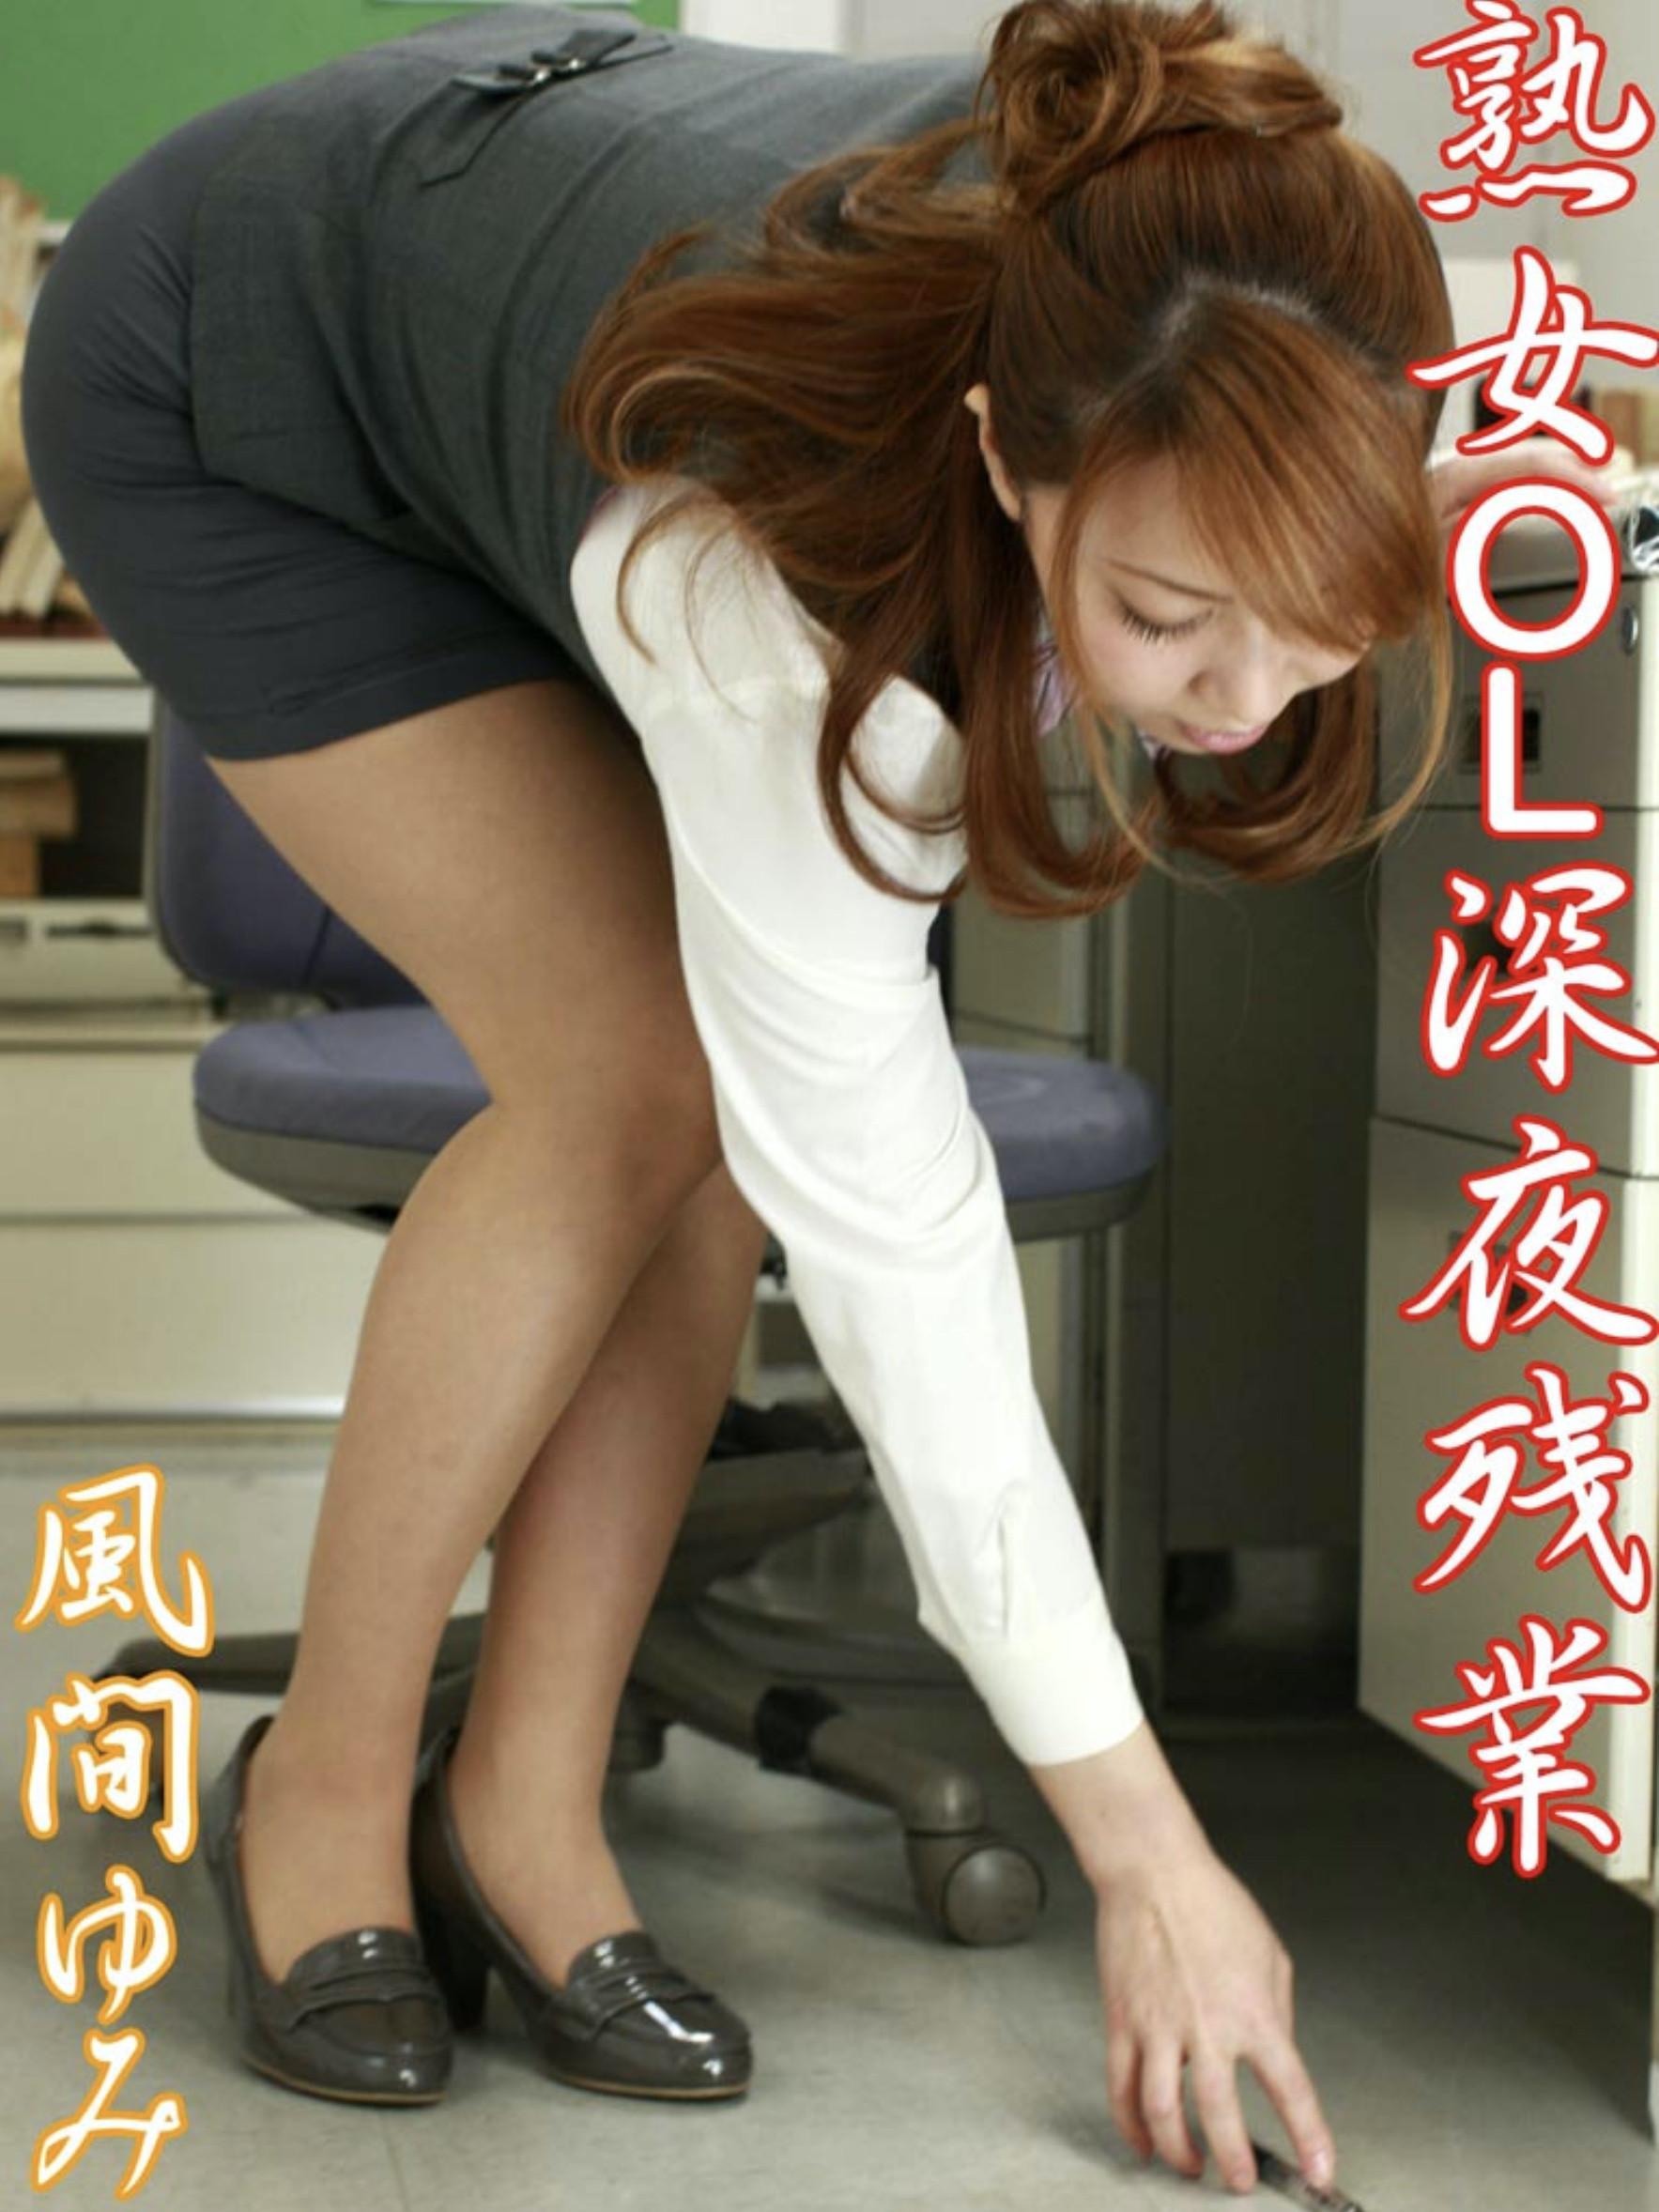 [Digital Photobook] Yumi Kazama 風間ゆみ – Mature OL midnight overtime 熟女OL深夜残業 (2013-06-14)